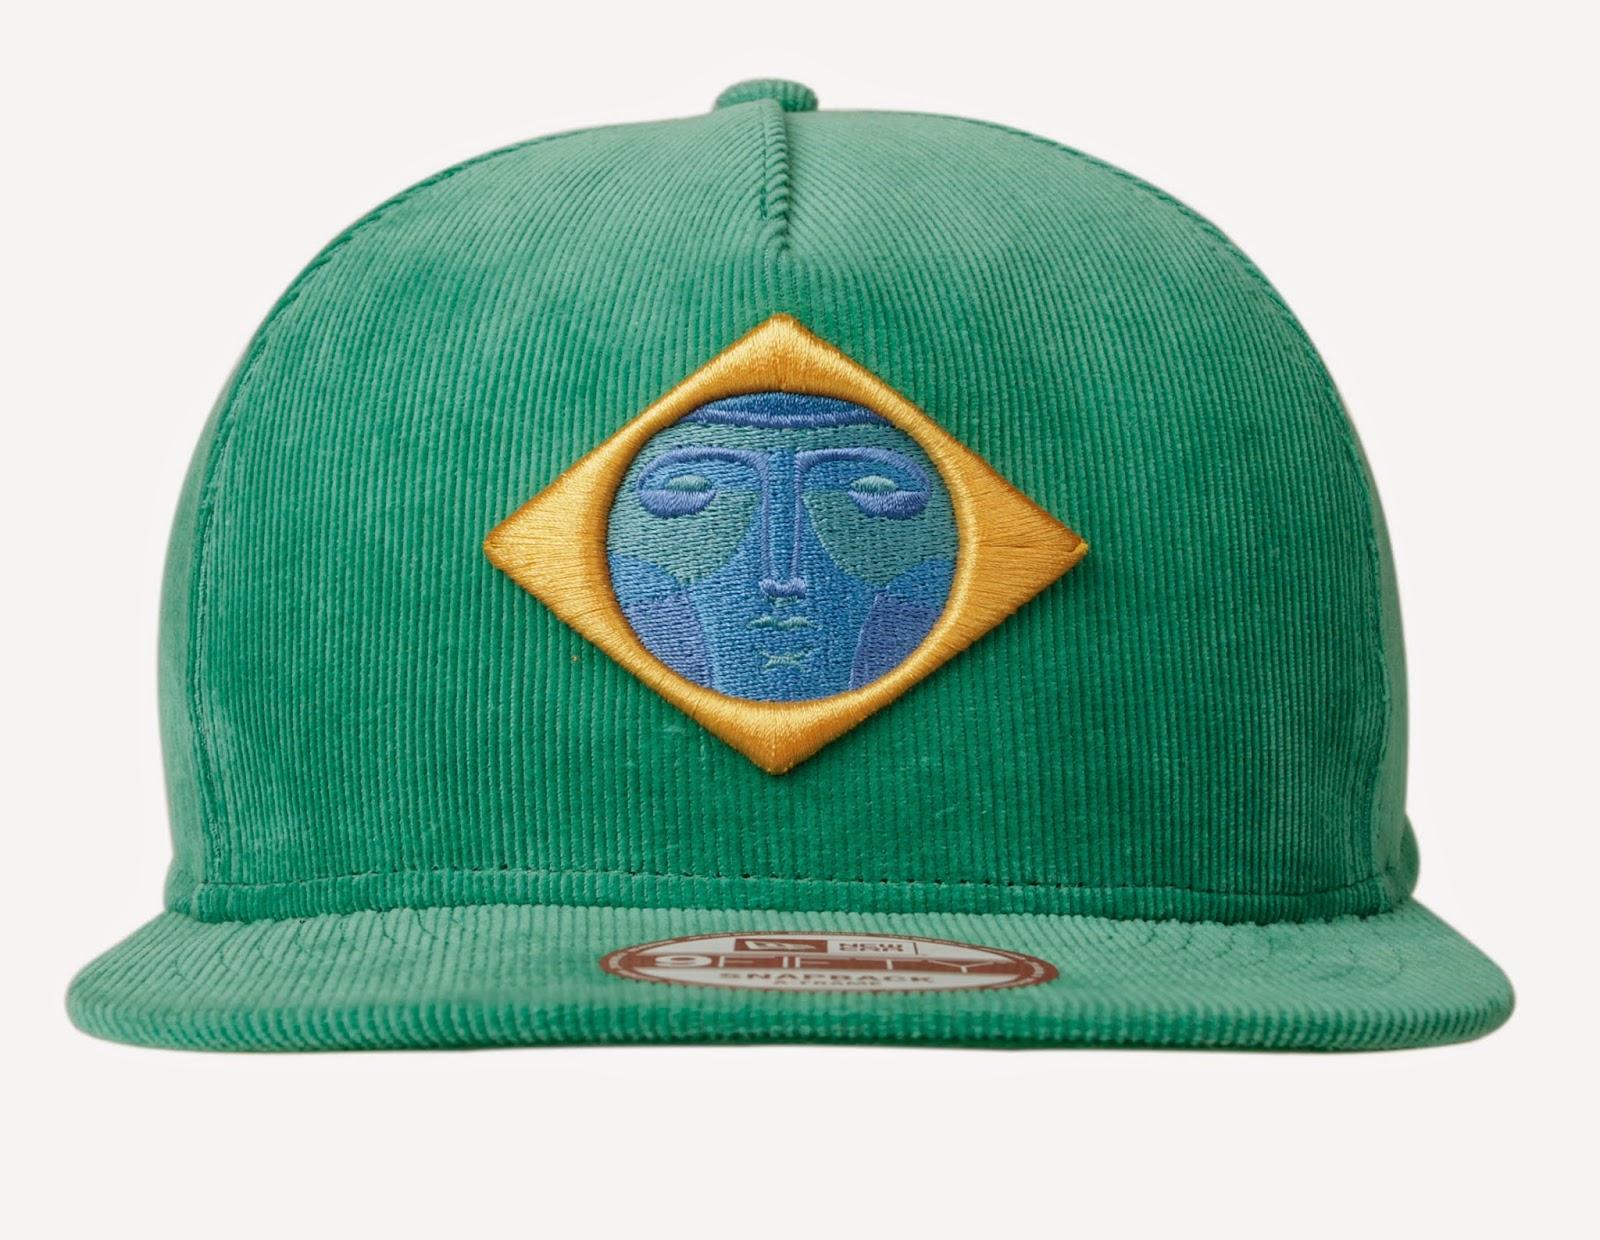 new era brasil  New Era em homenagem ao Brasil 3a7a218d77b